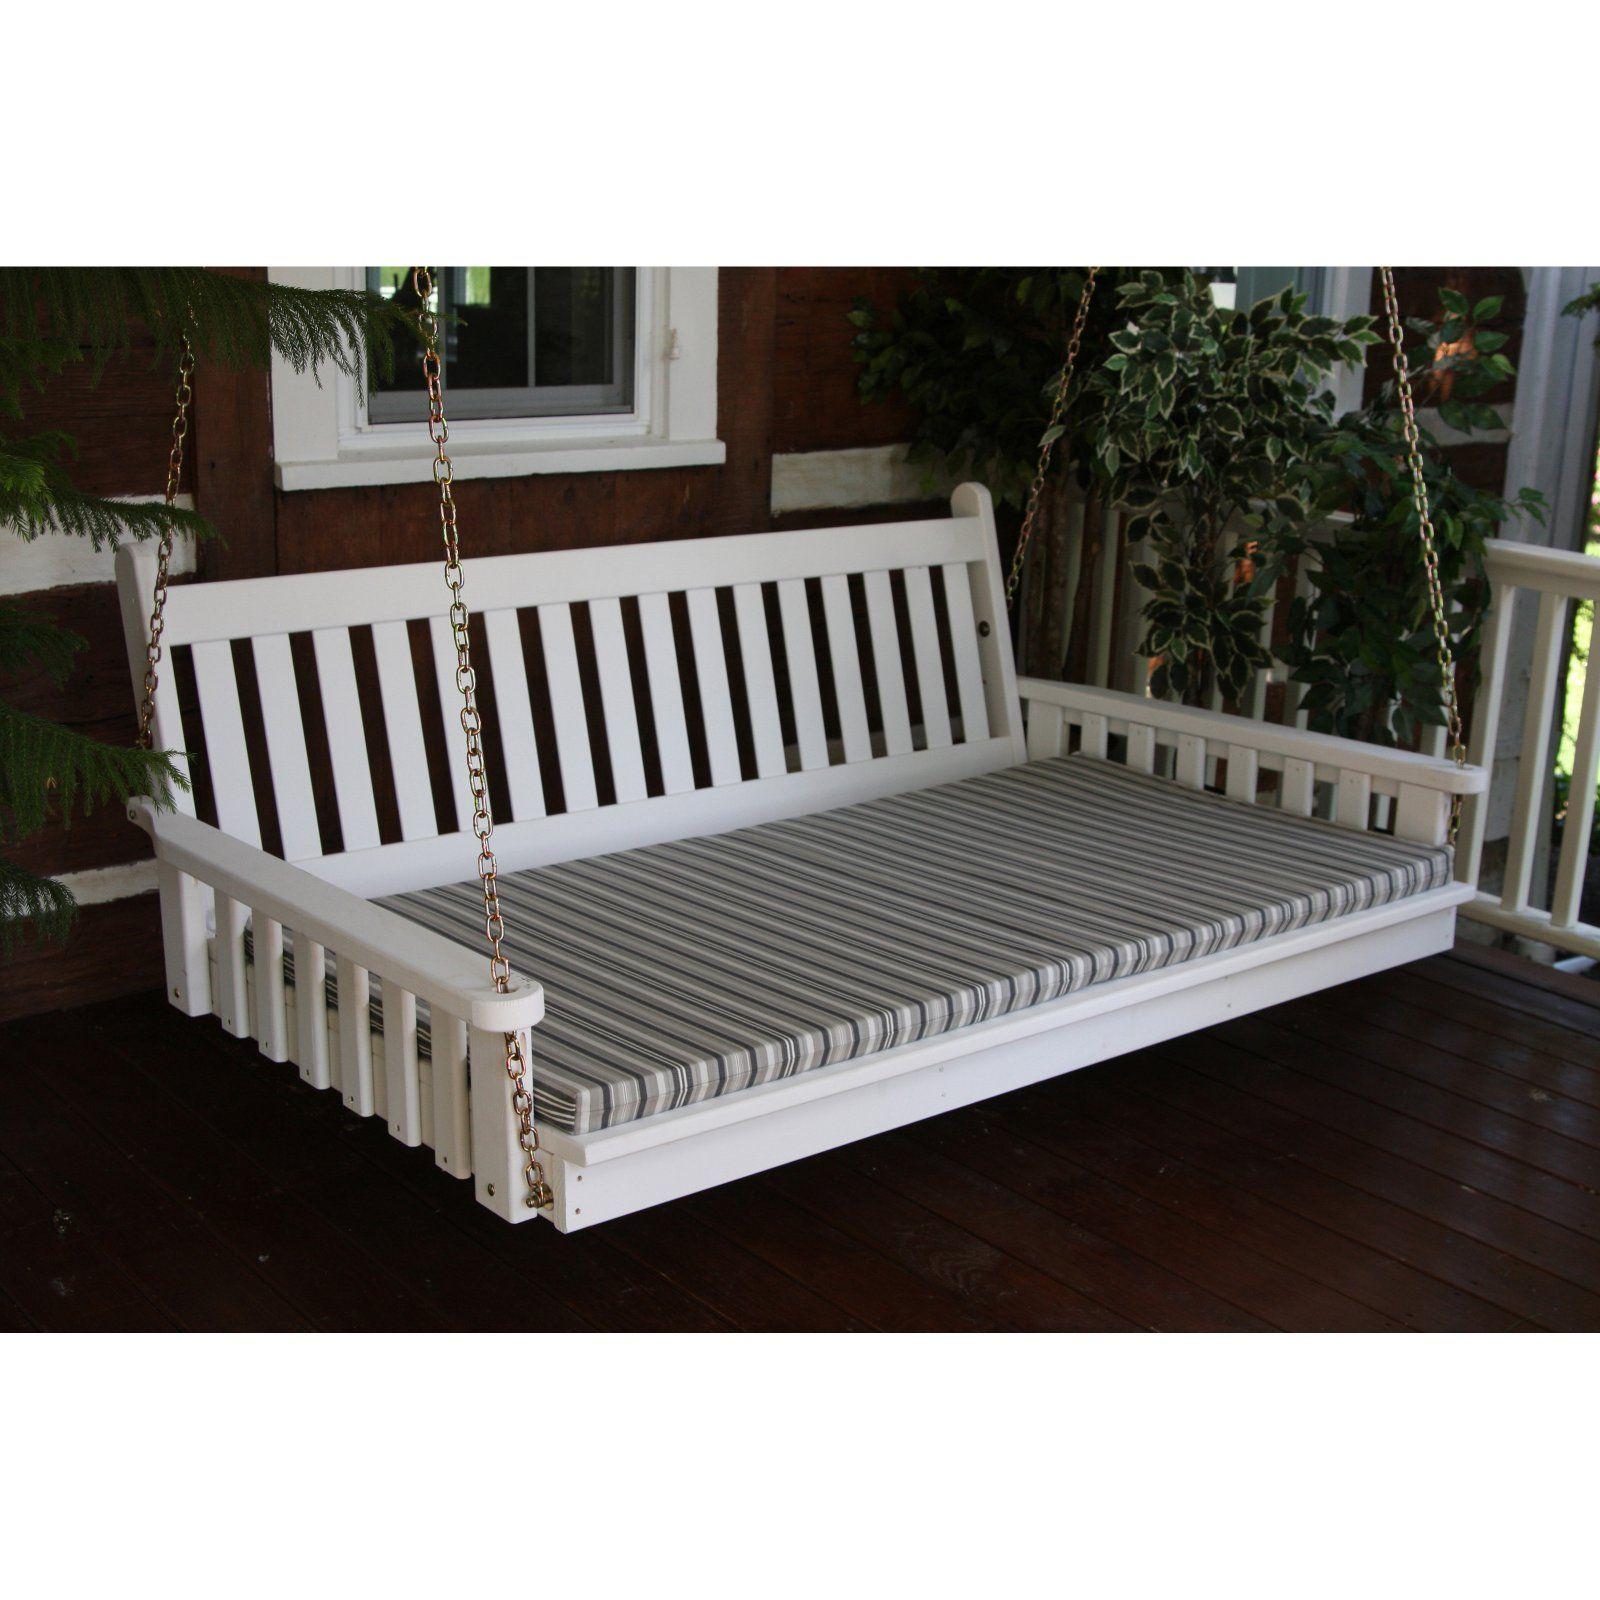 A L Furniture Sundown Agora 4 Ft Swing Bed Cushion Gray Stripe